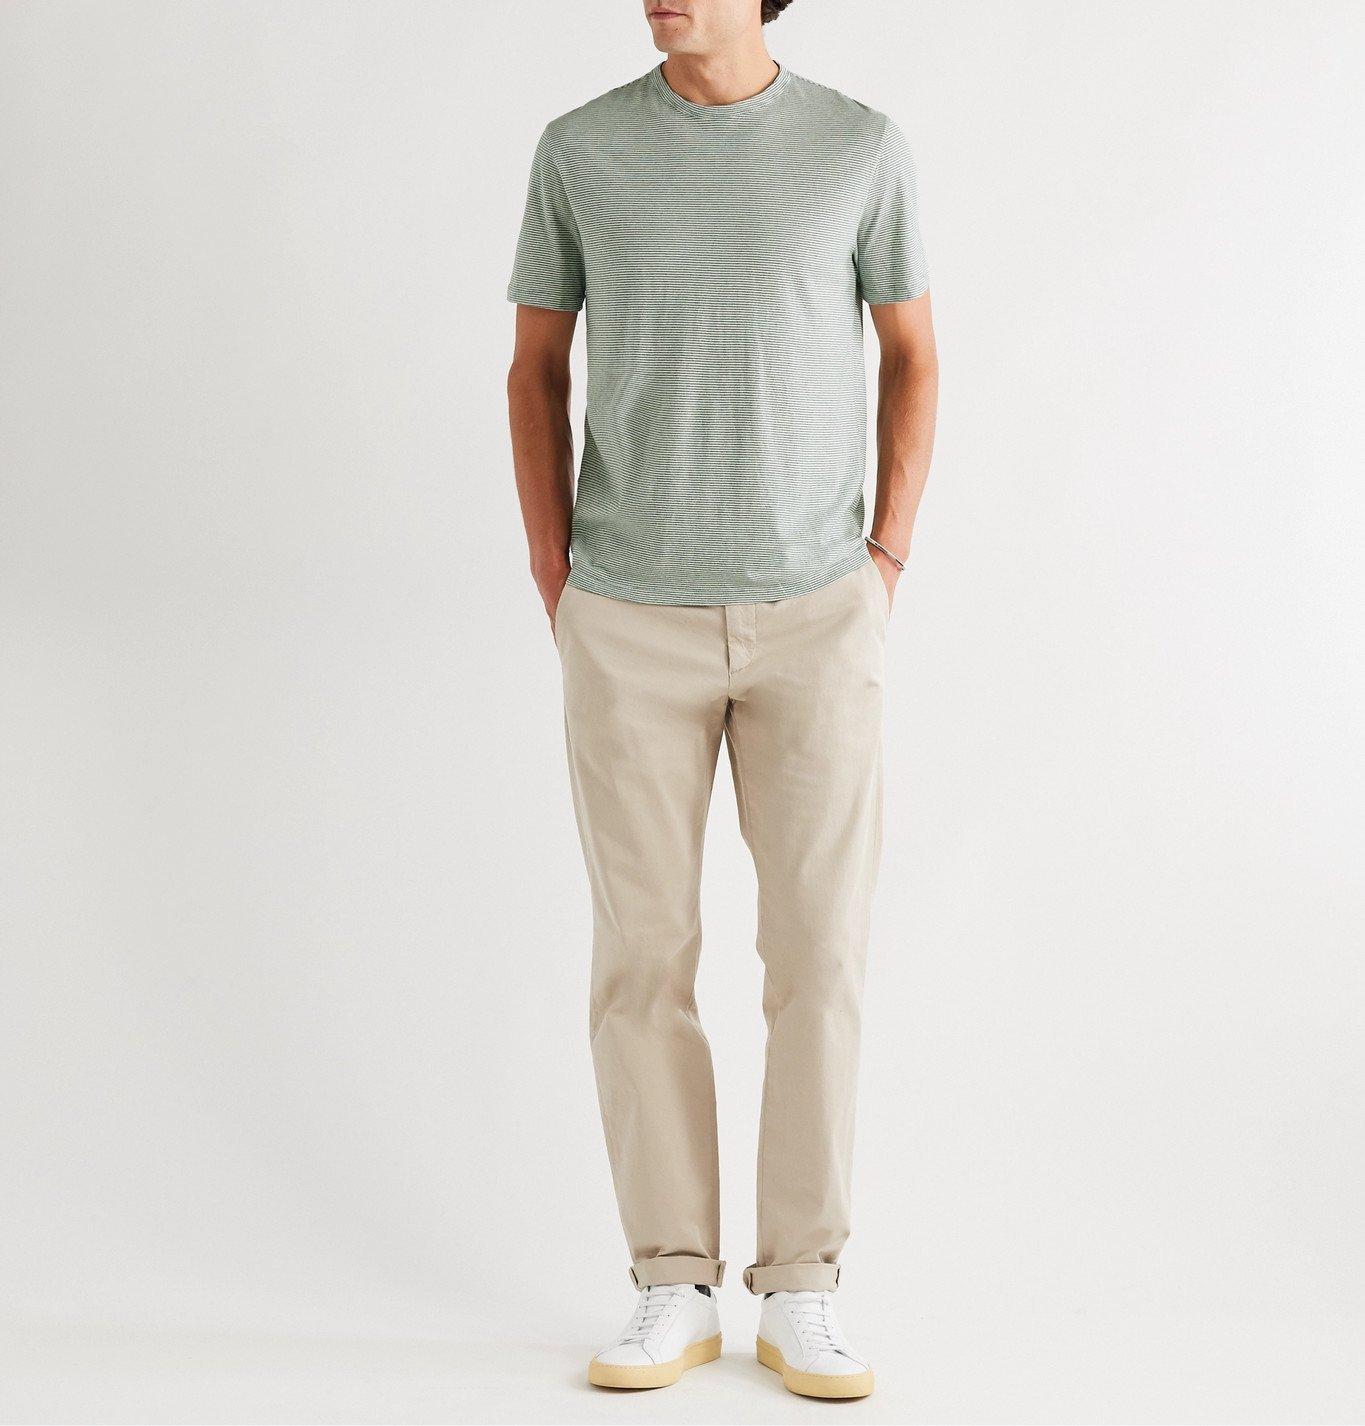 Officine Generale - Striped Cotton-Jersey T-Shirt - Green